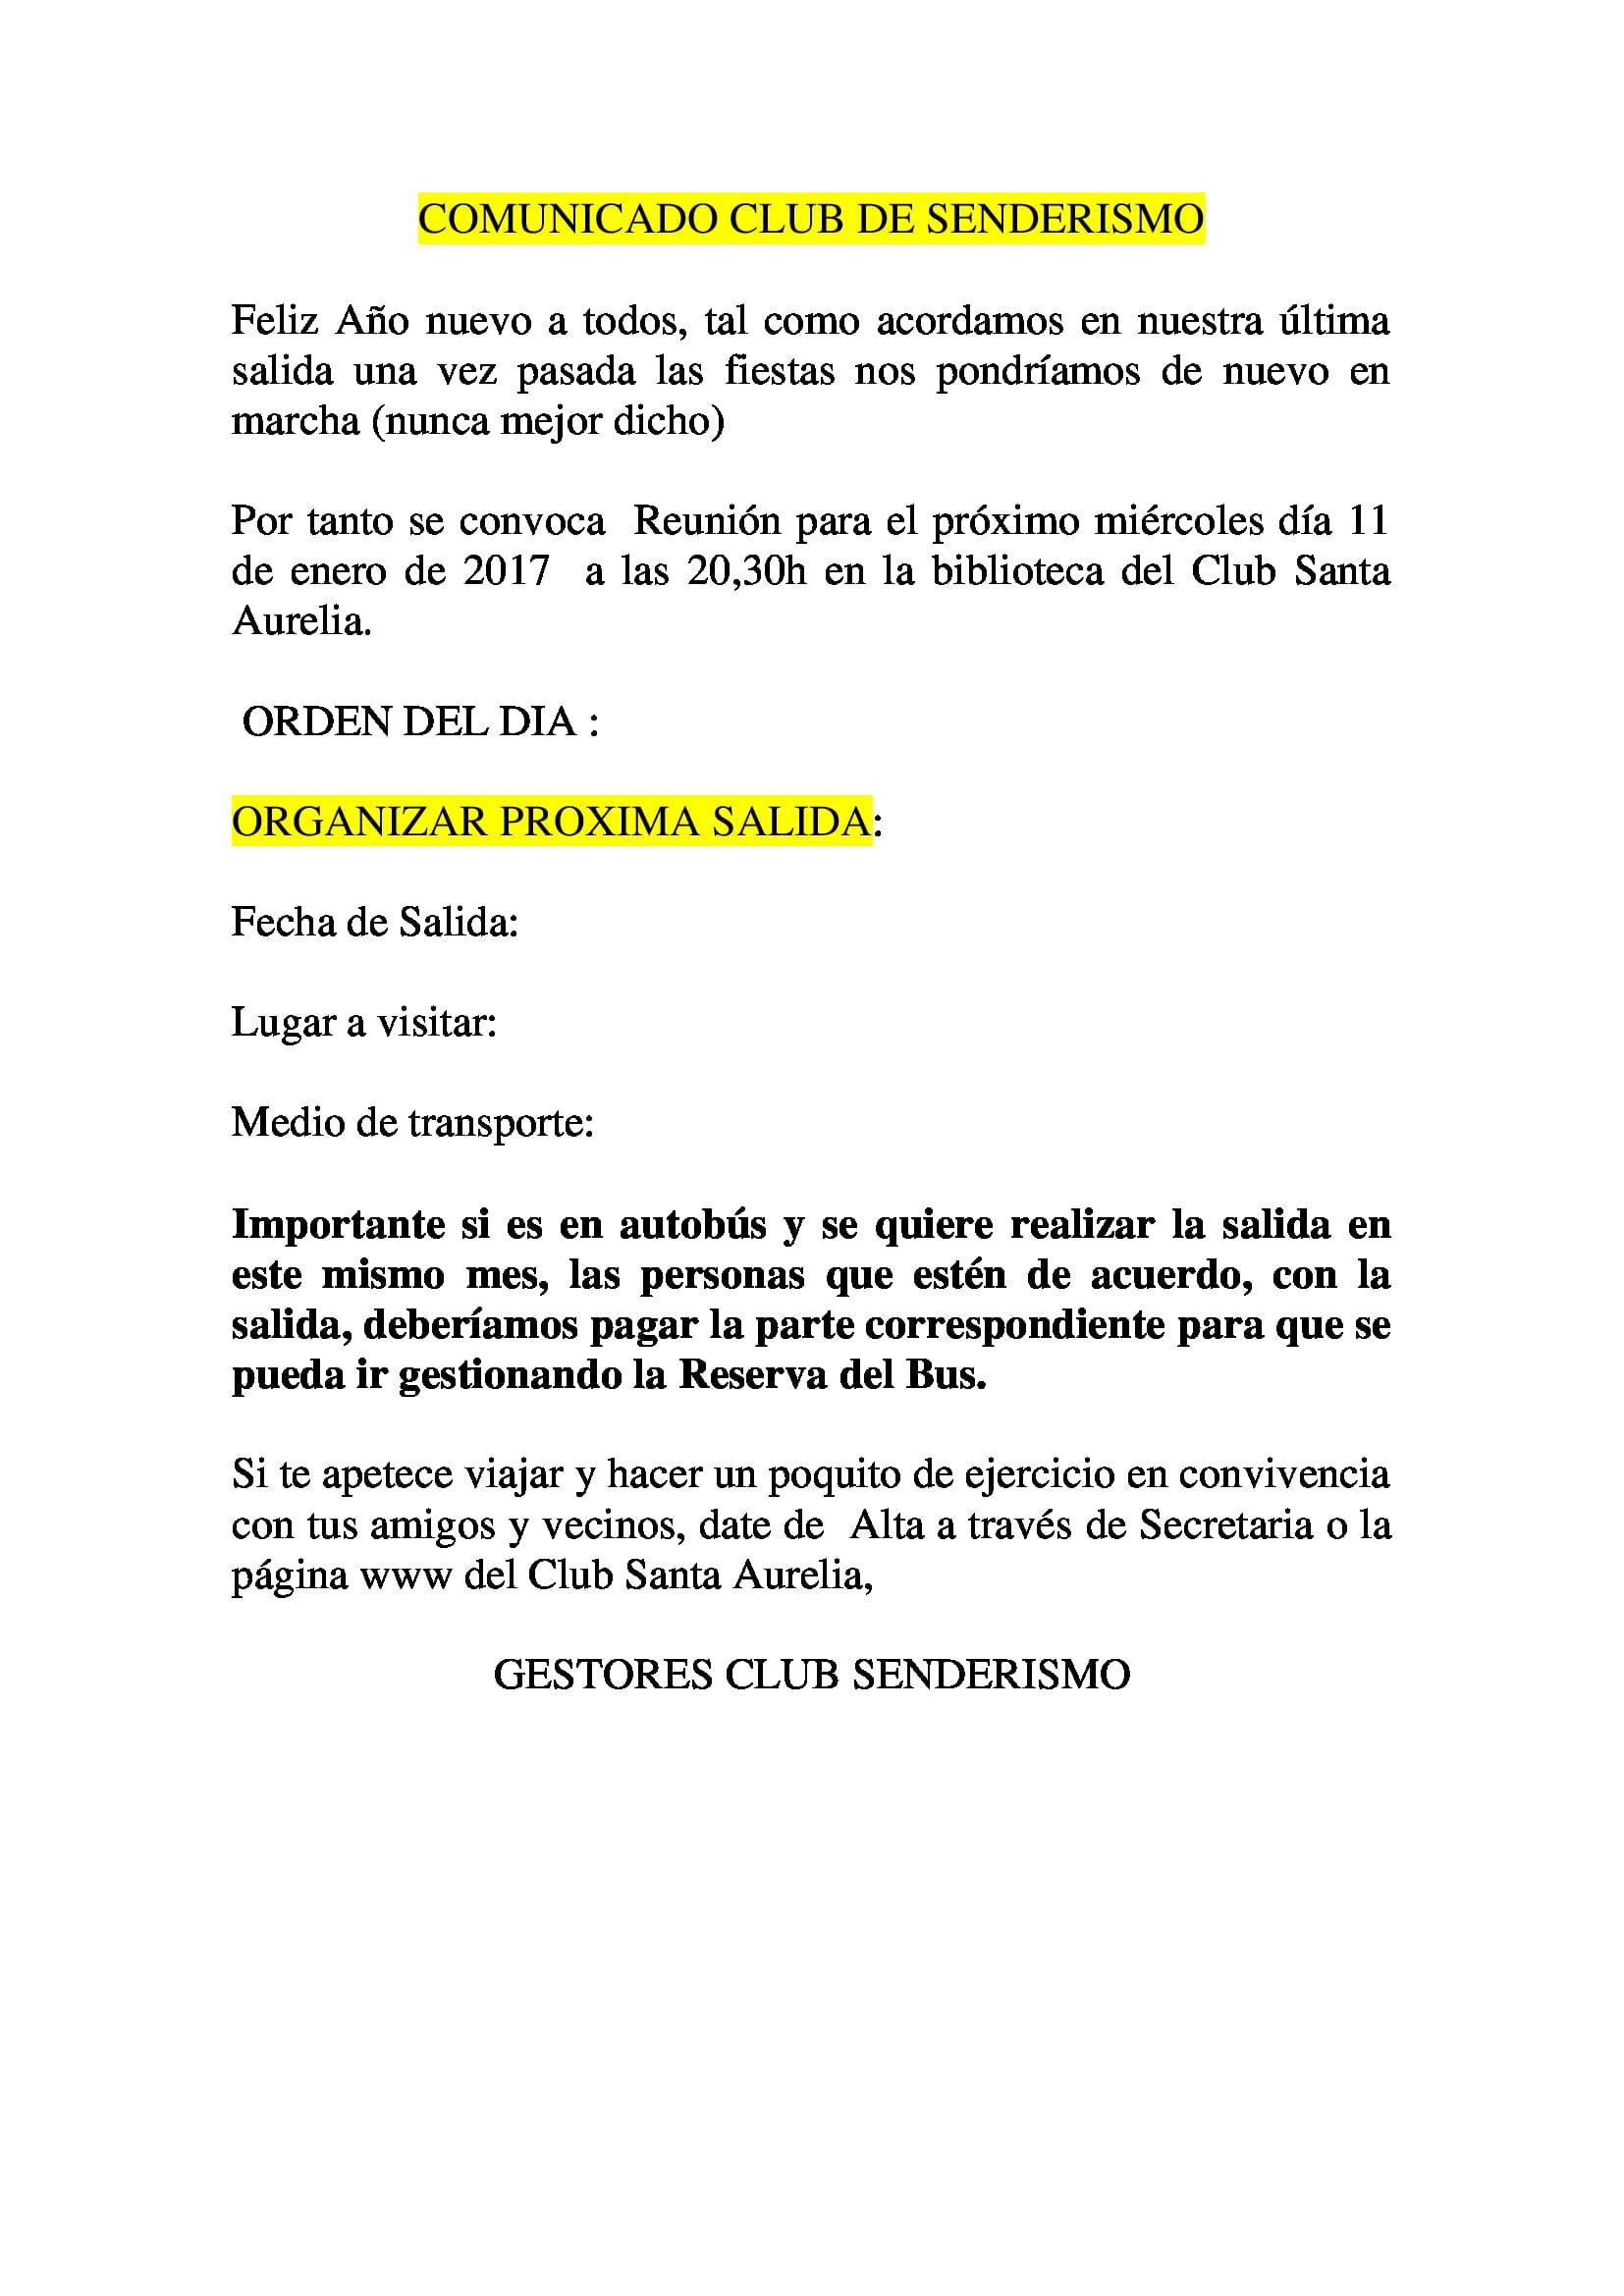 CLUB DE SENDERISMO REUNION 11 ENERO 17 1